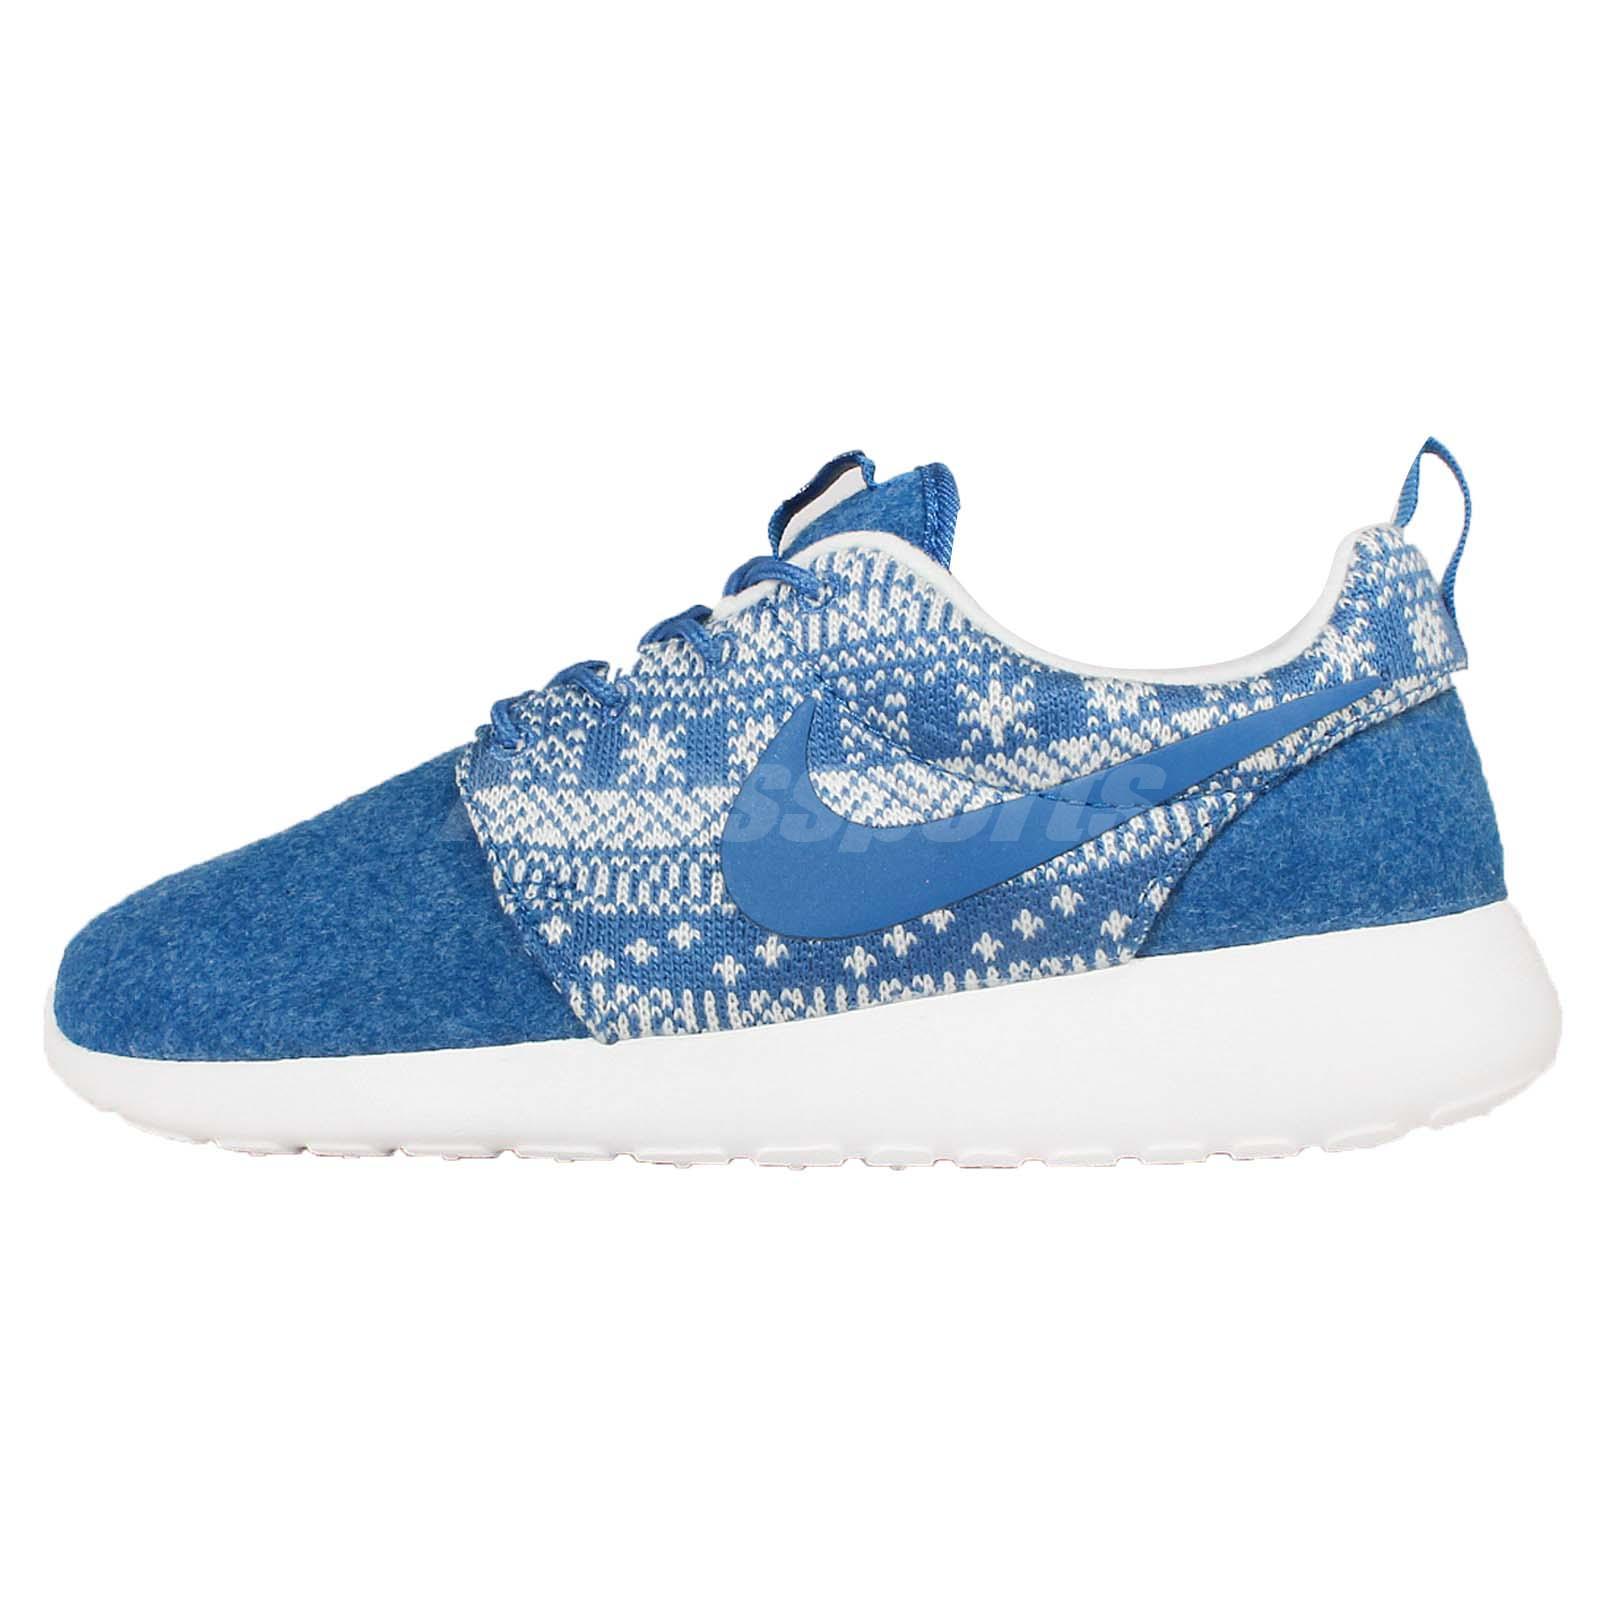 eljmi Wmns Nike Roshe One Winter Print Blue Snowflake Womens Running